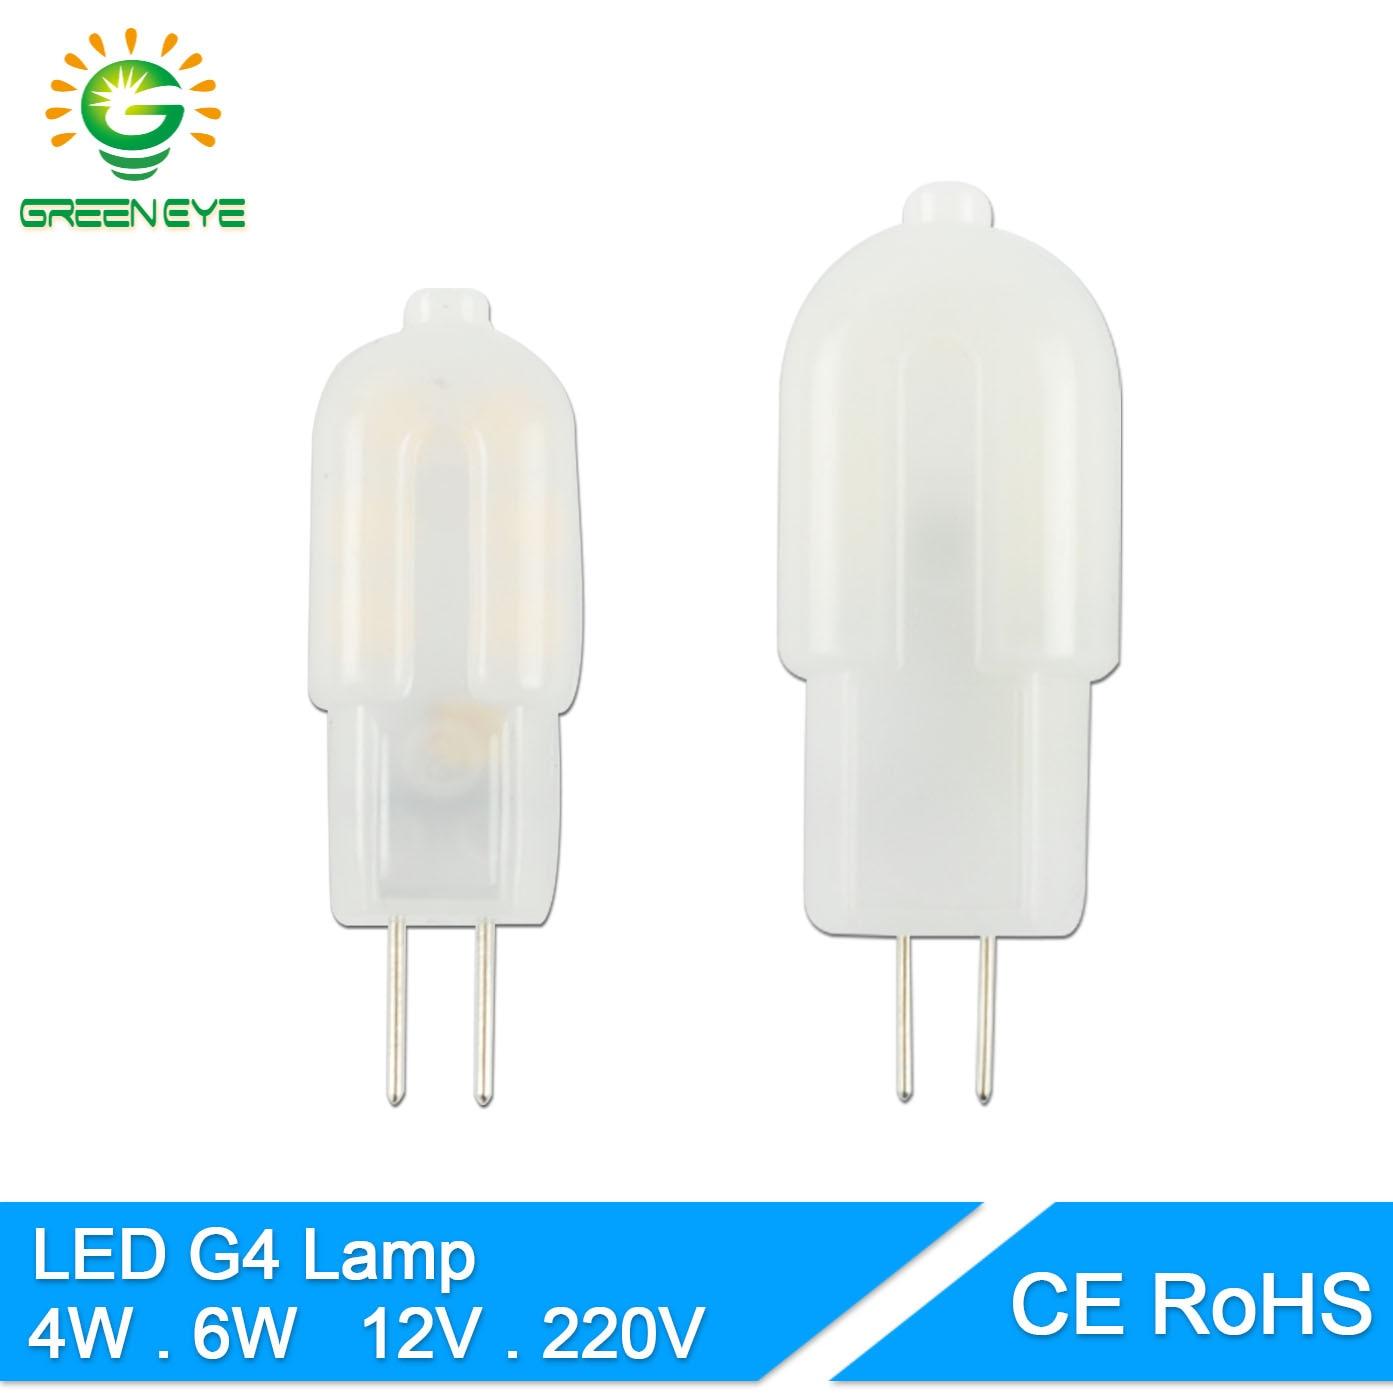 Green-eye-10pcs-lot-12V-220V-dimmable-G4-LED-font-b-Lamp-b-font-LED-font Faszinierend R7s Led 118mm Dimmbar Dekorationen